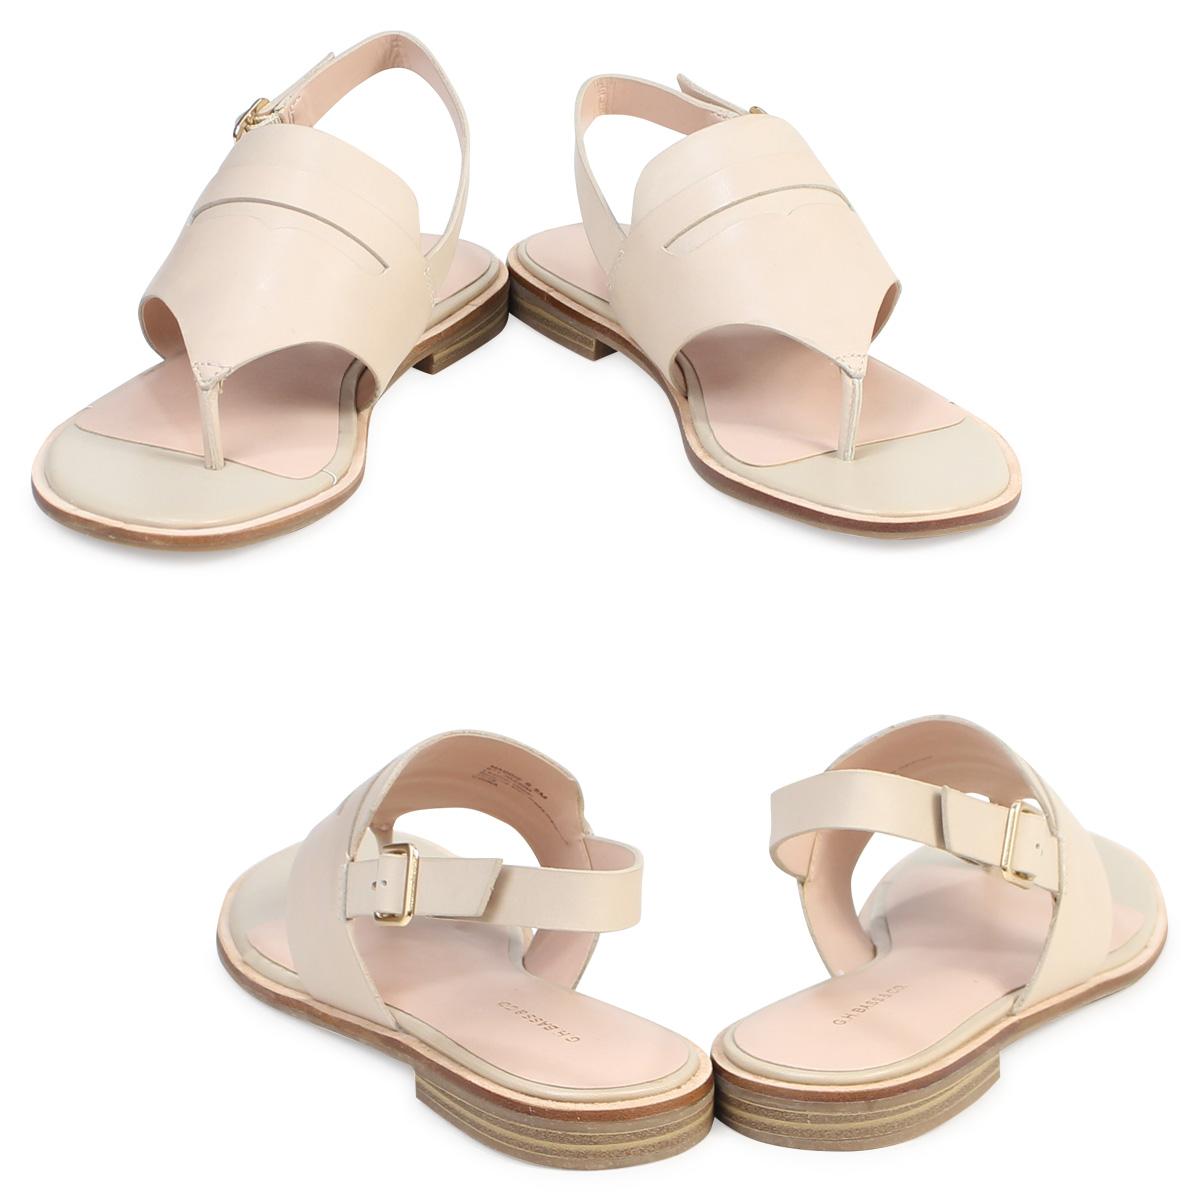 4b6953ed18b G.H. BASS sandals lady's G H bus tong ankle strap MADDIE THONG SANDAL  71-20,330 shoe polish